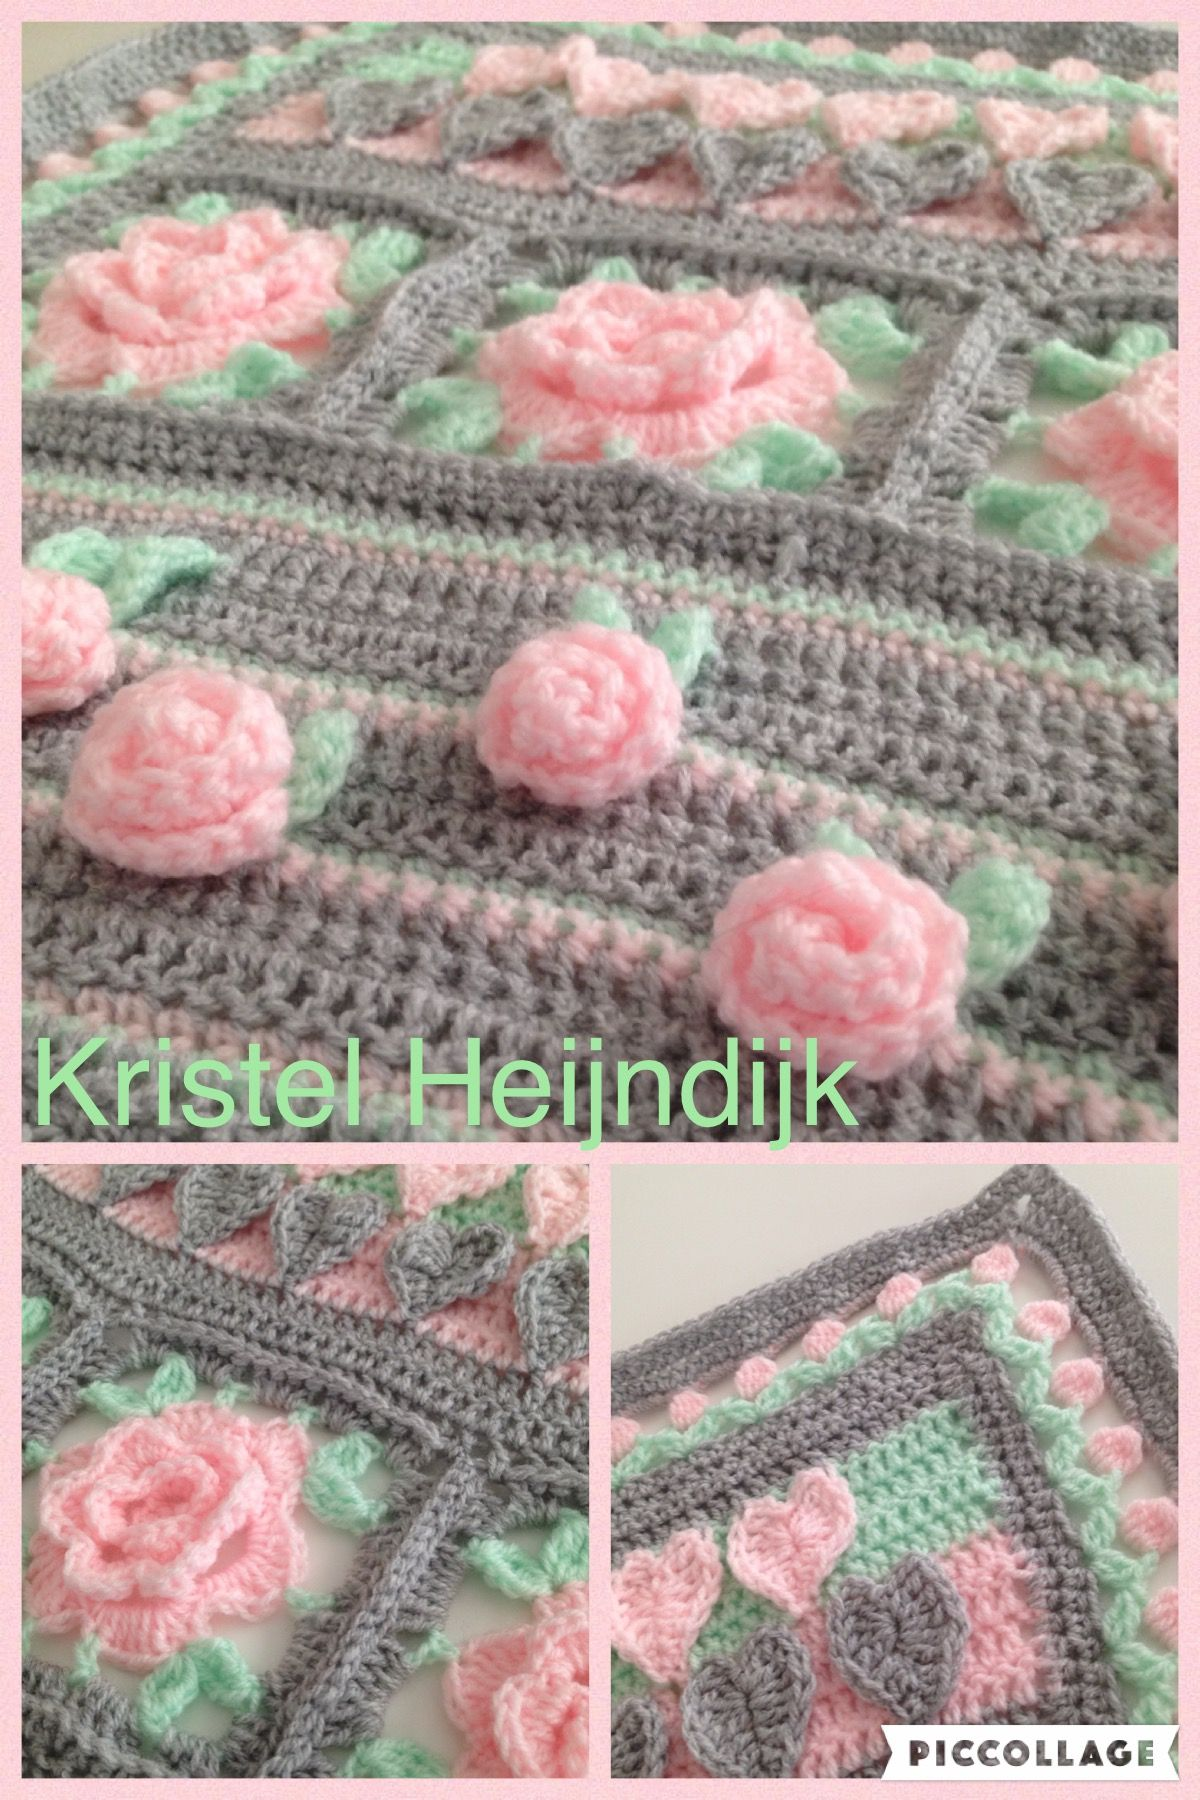 Pin de Sharlene Robinson en Crocheting | Pinterest | Flores de ...